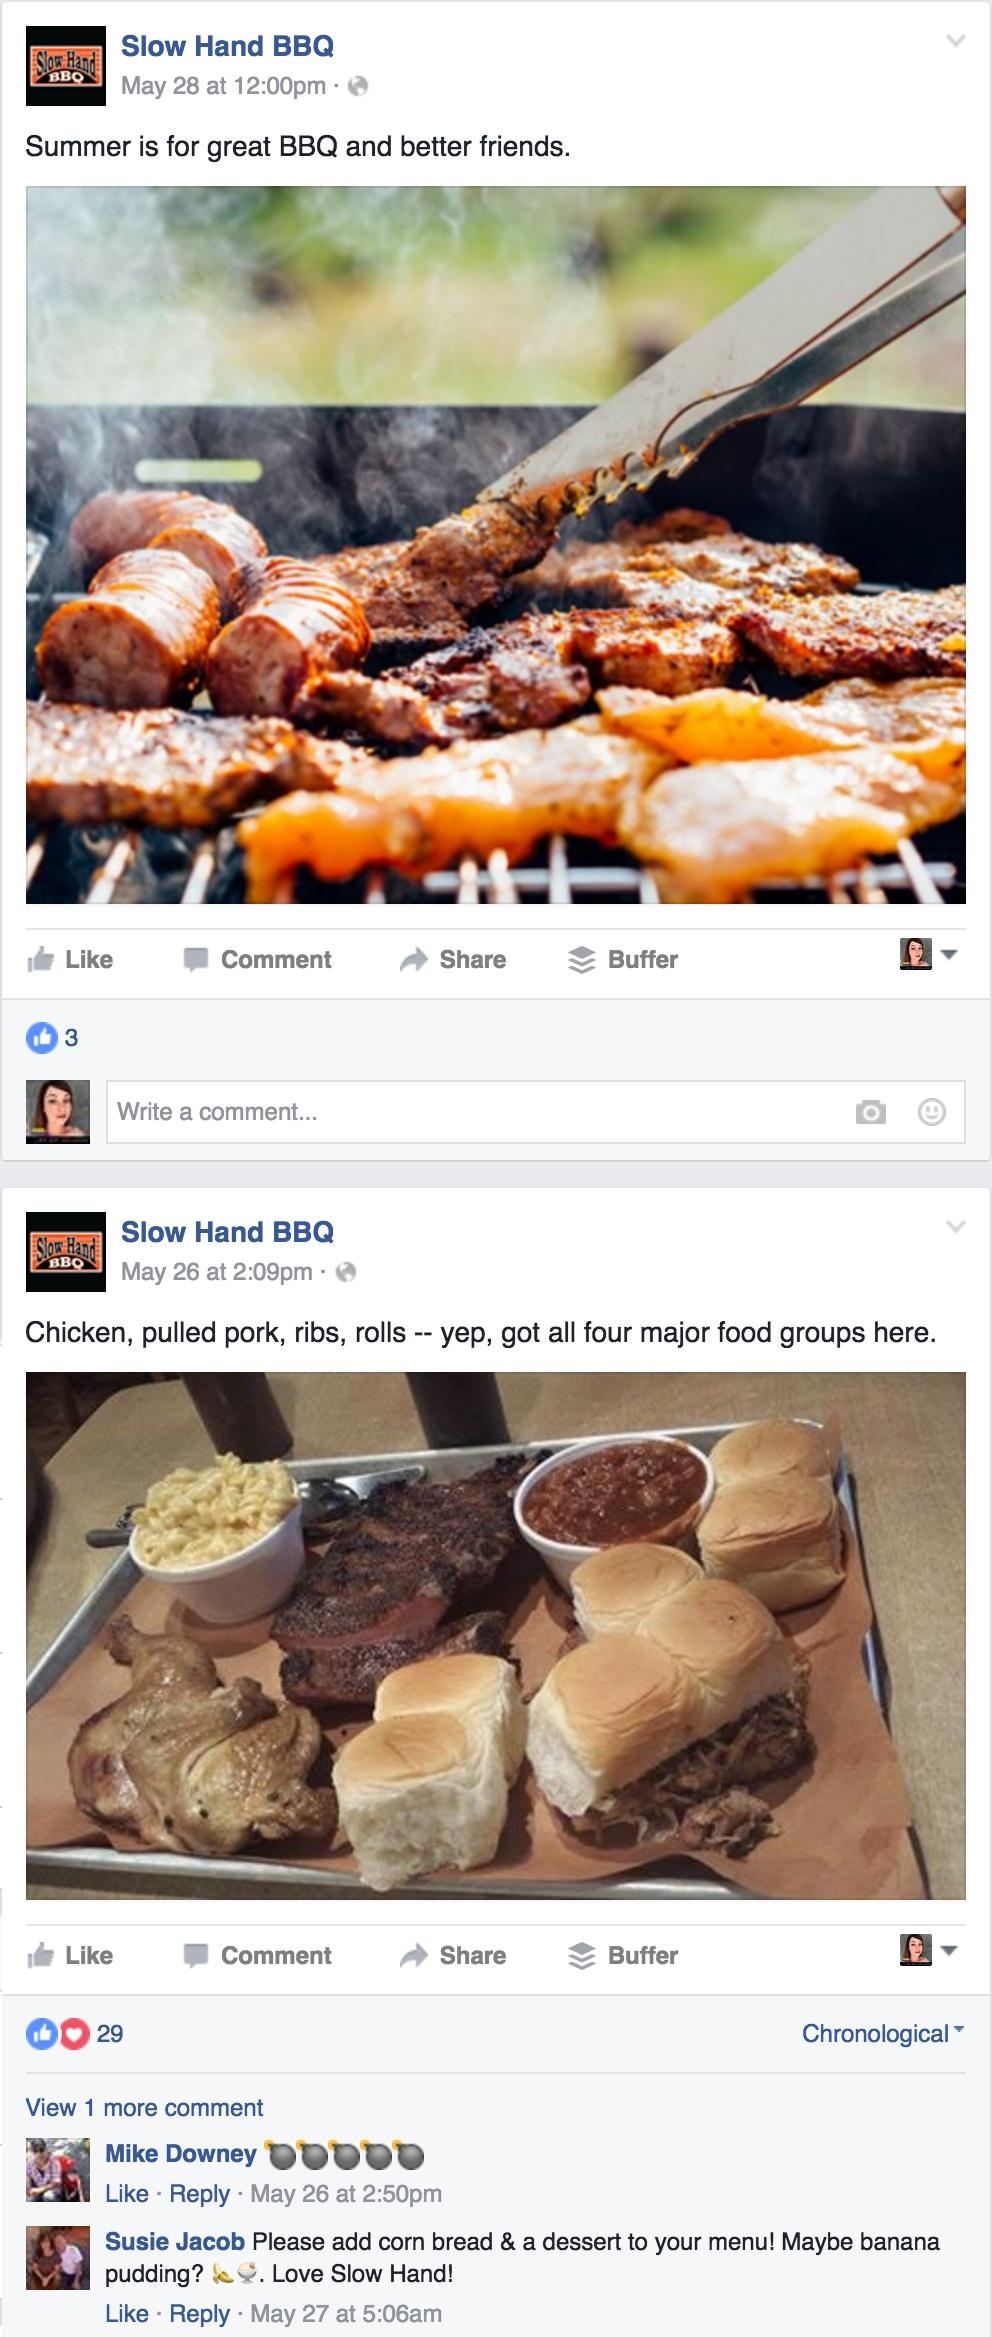 Slow Hand BBQ Facebook